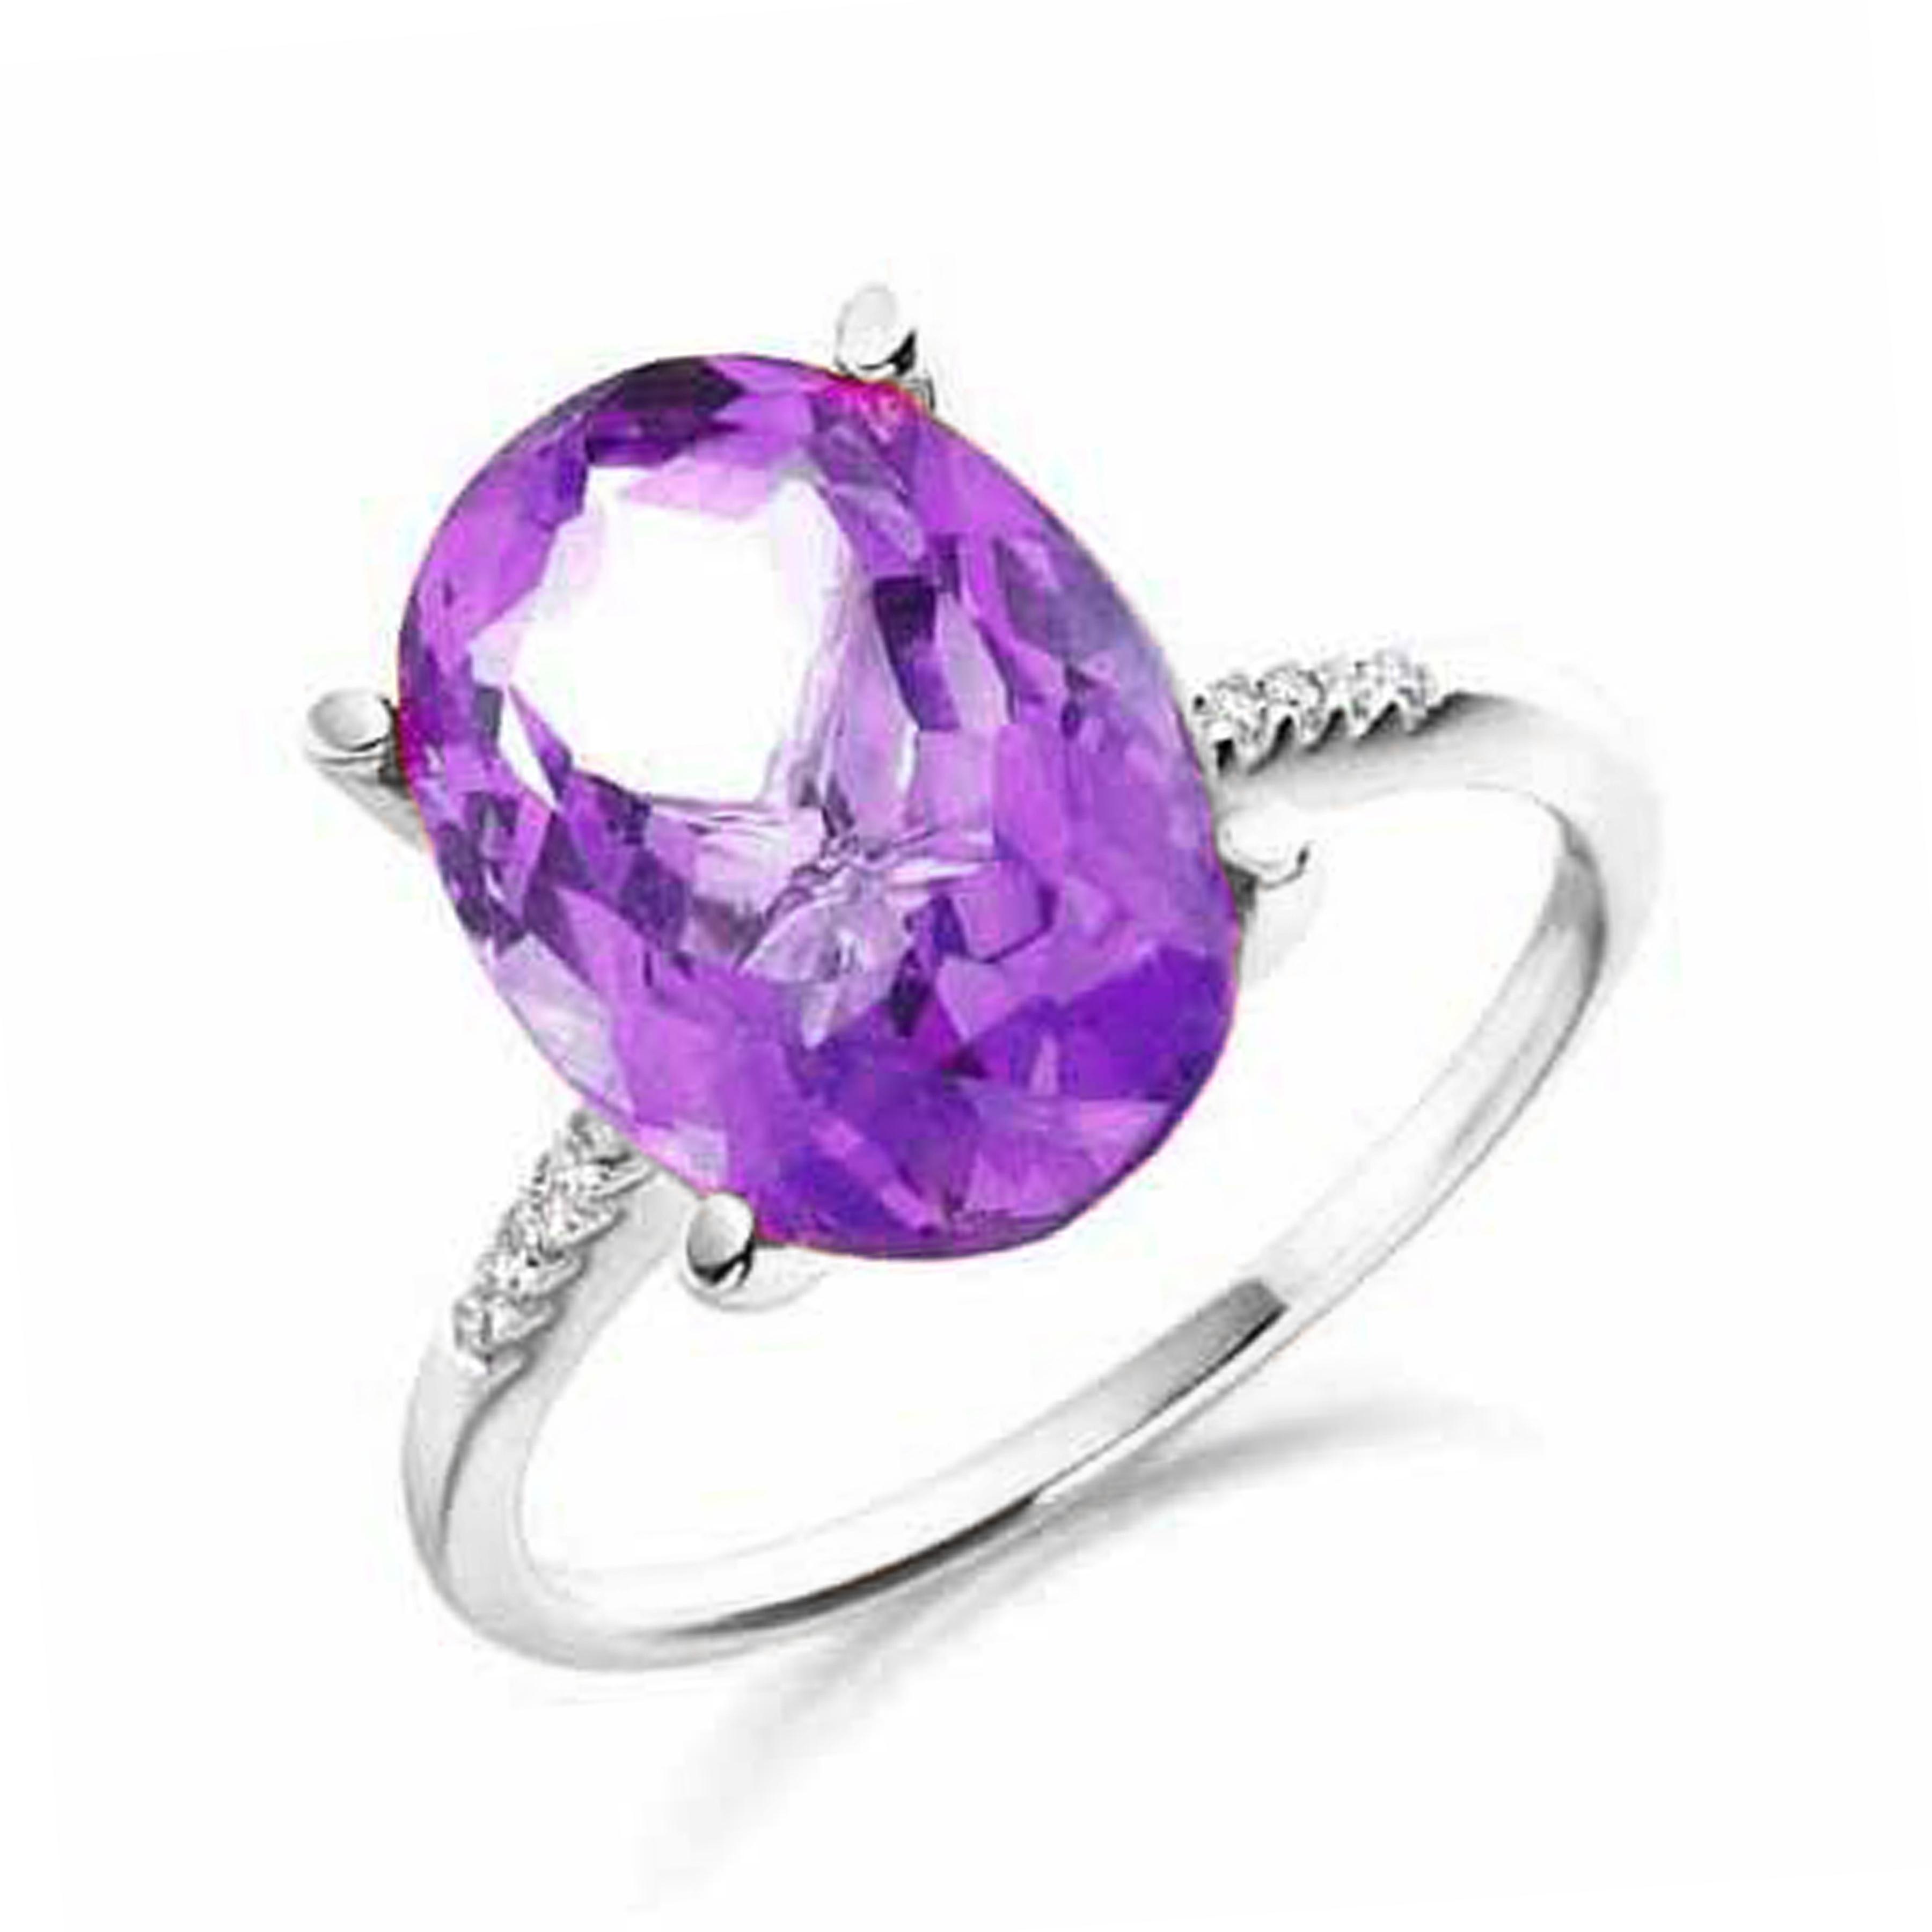 Round Cut Diamond Cluster Earrings / Birthday Gift (0.25Ct - 5.8mm)